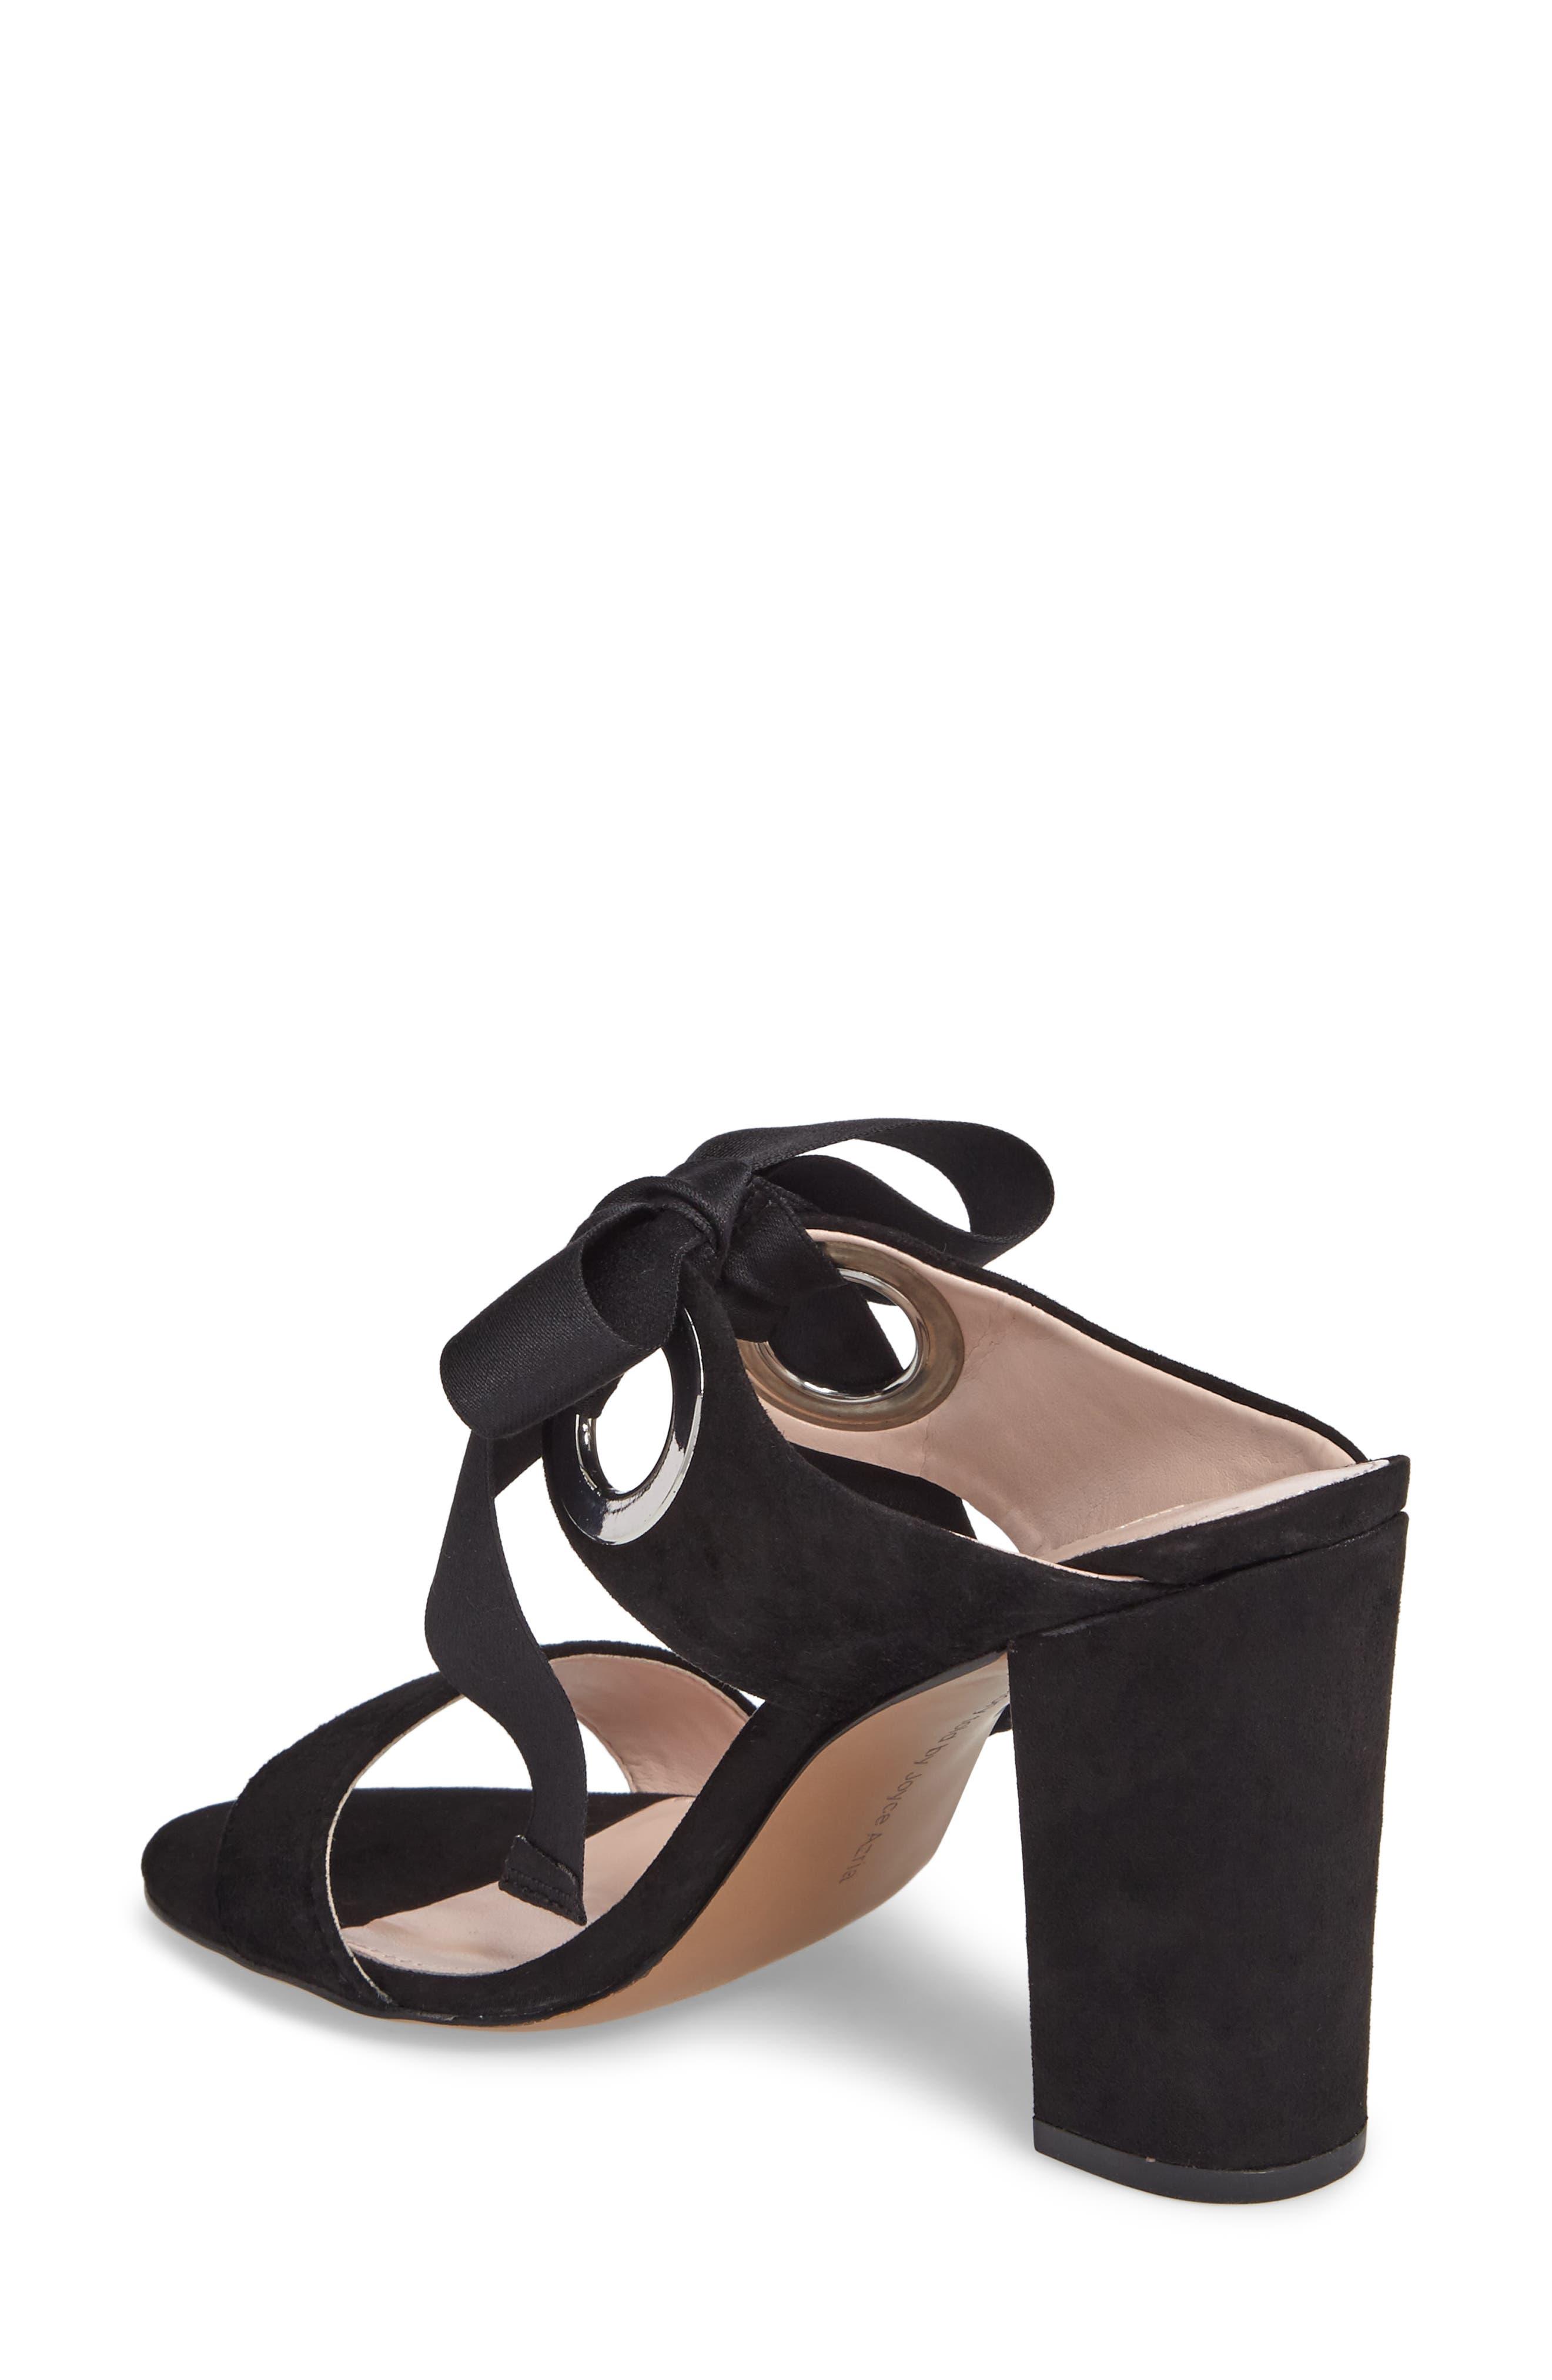 Megan Tie Strap Sandal,                             Alternate thumbnail 3, color,